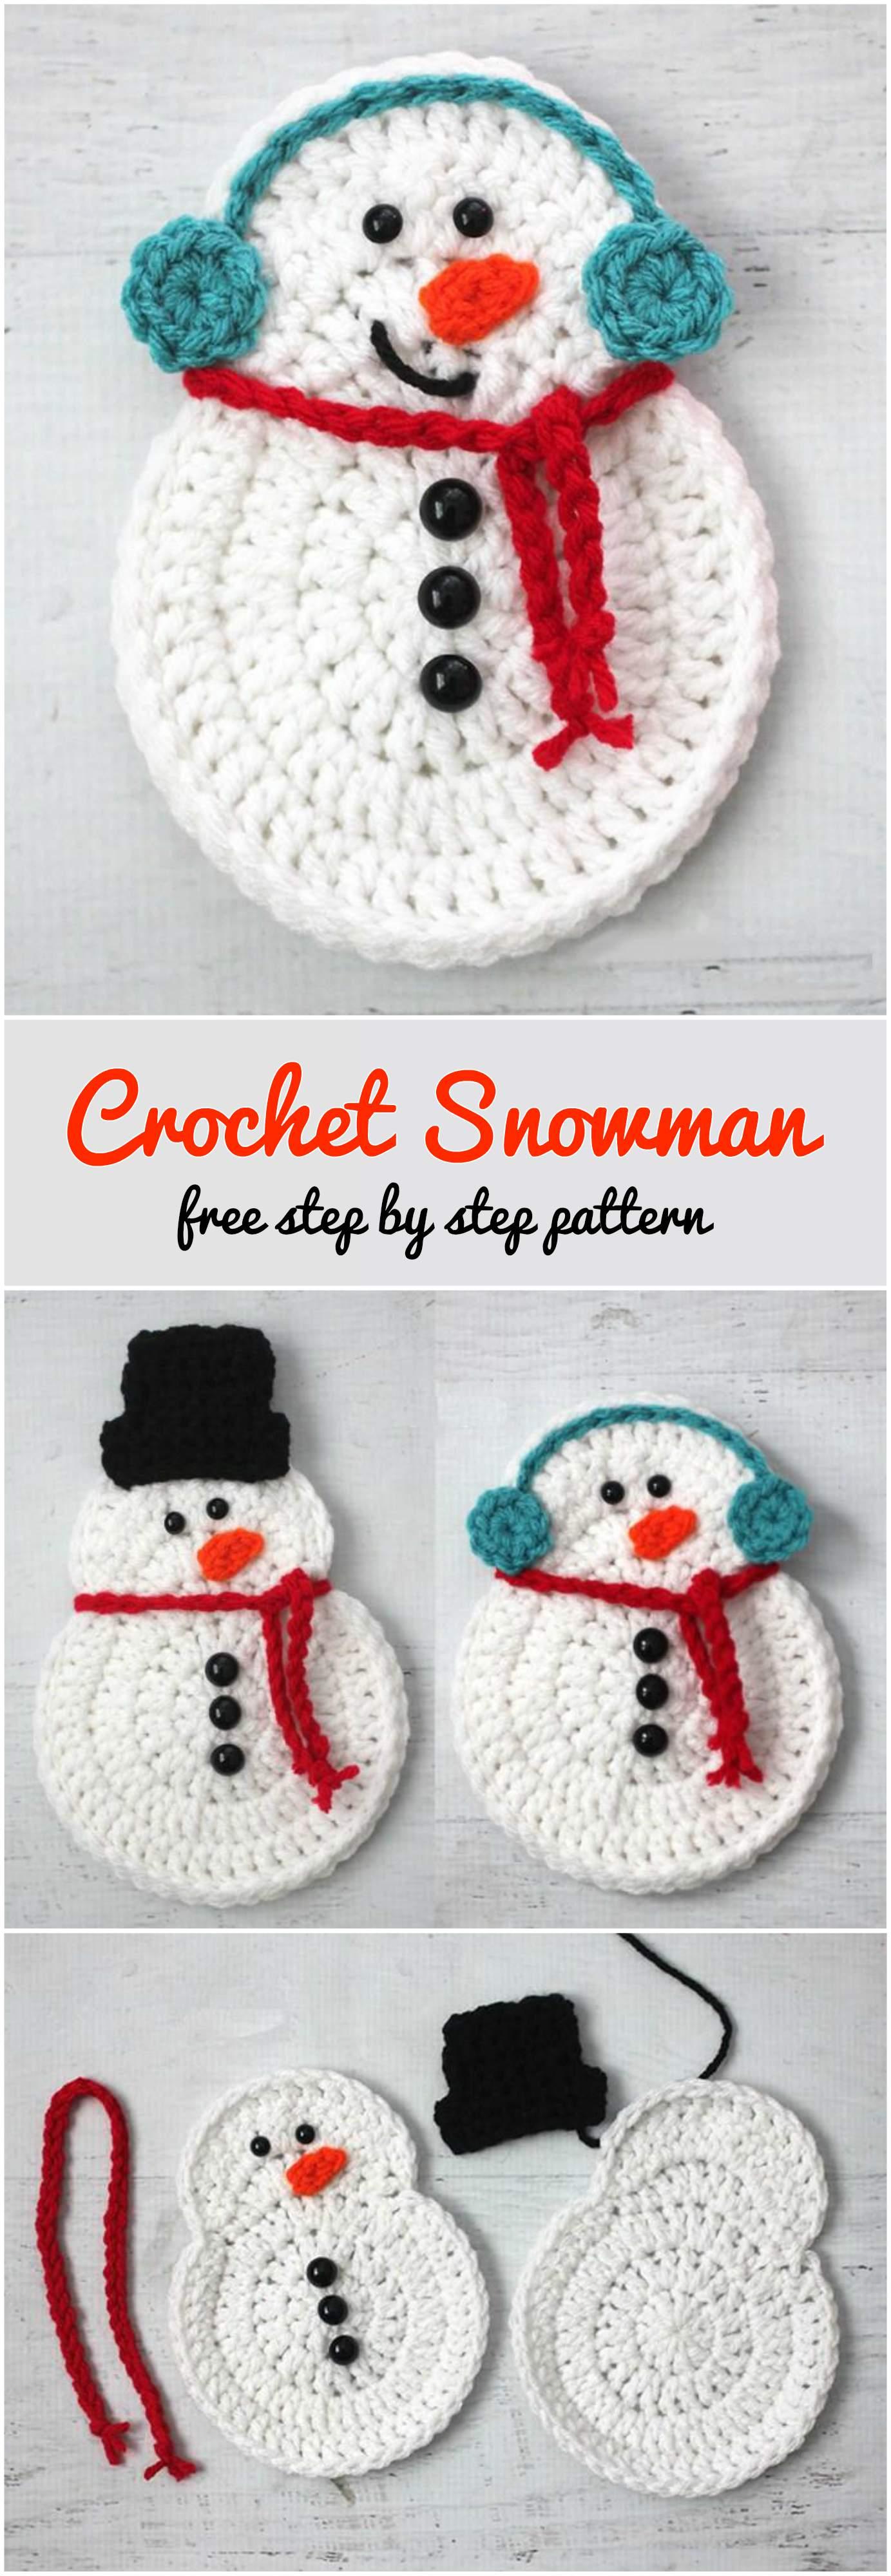 crochet snowman step by step pretty ideas